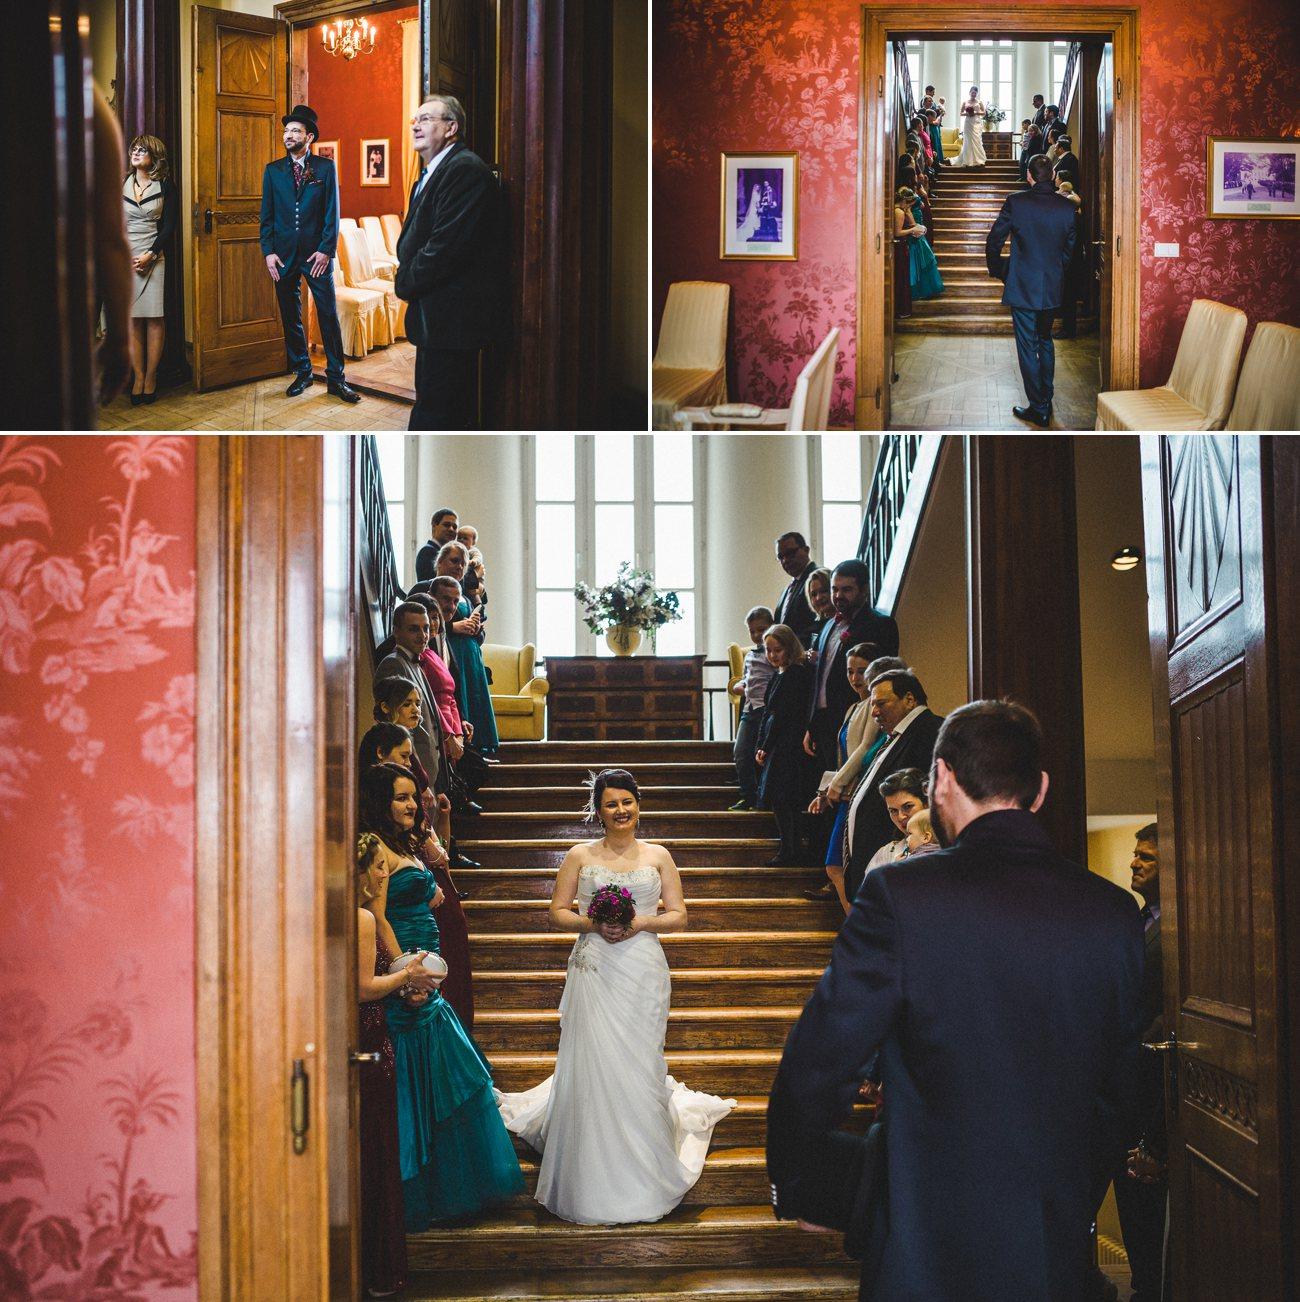 Hochzeitsfotograf_Schloss_Luebbenau 19